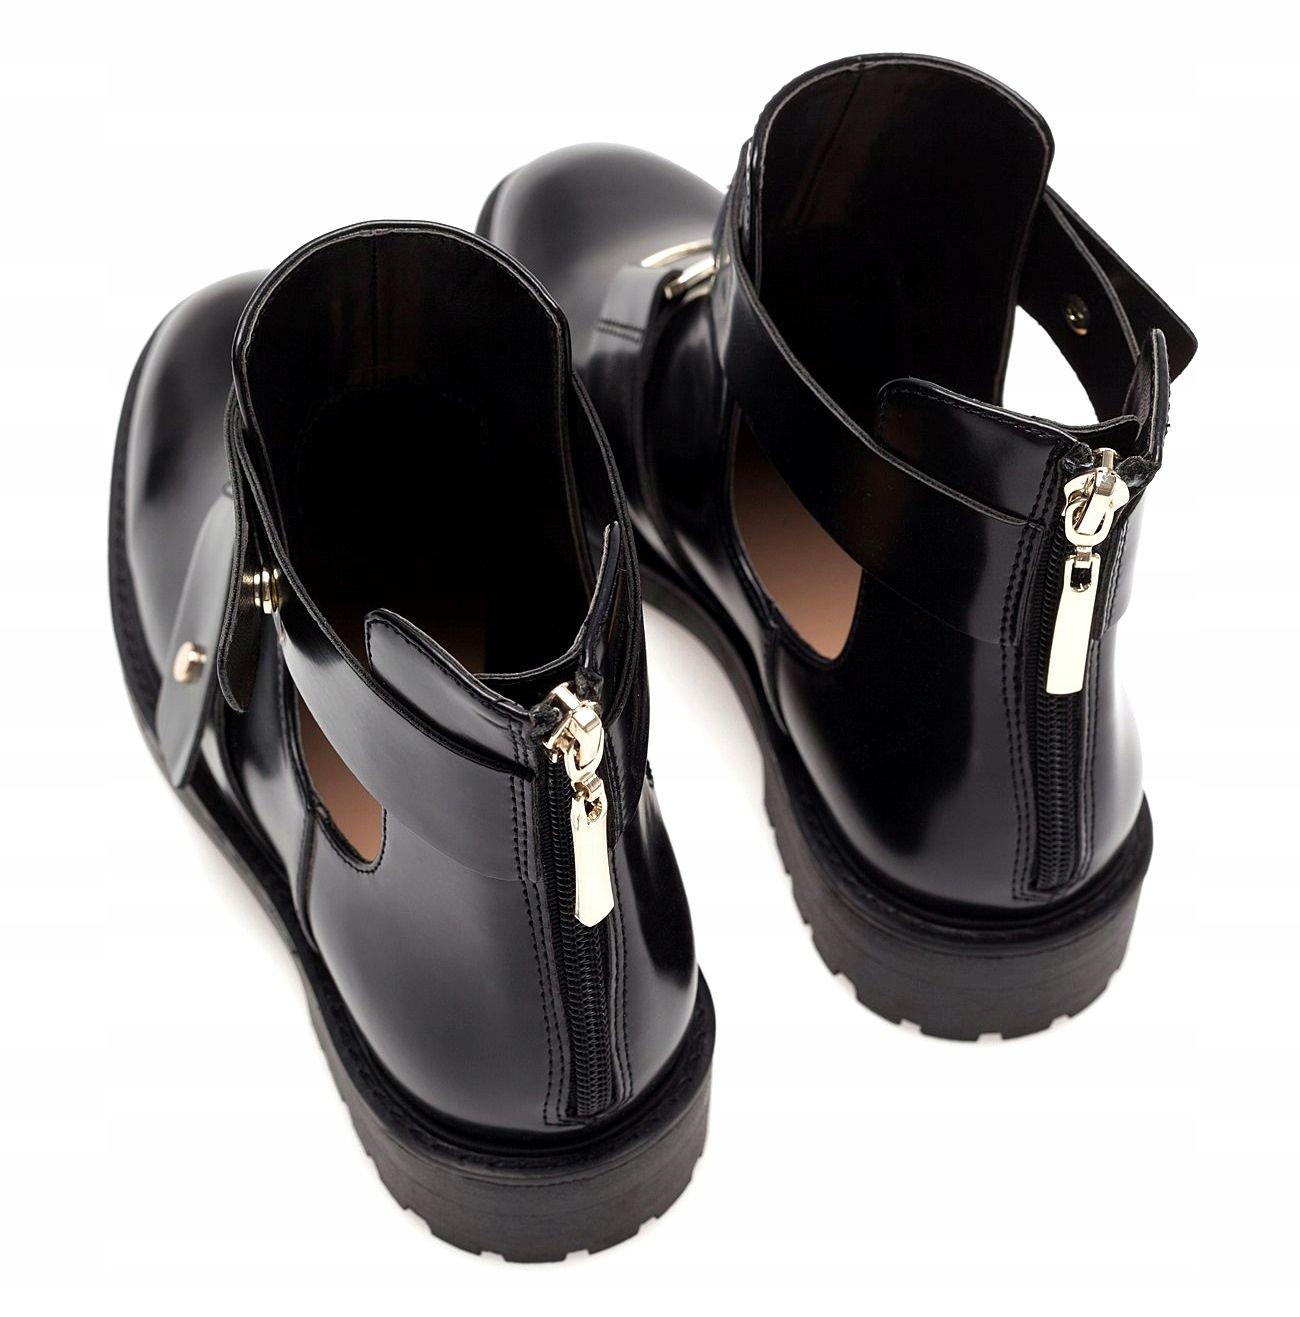 Buty Meskie Adidas Terrex Ac7829 Gore Tex R 44 2 3 7588630879 Oficjalne Archiwum Allegro Boots Adidas Gore Tex